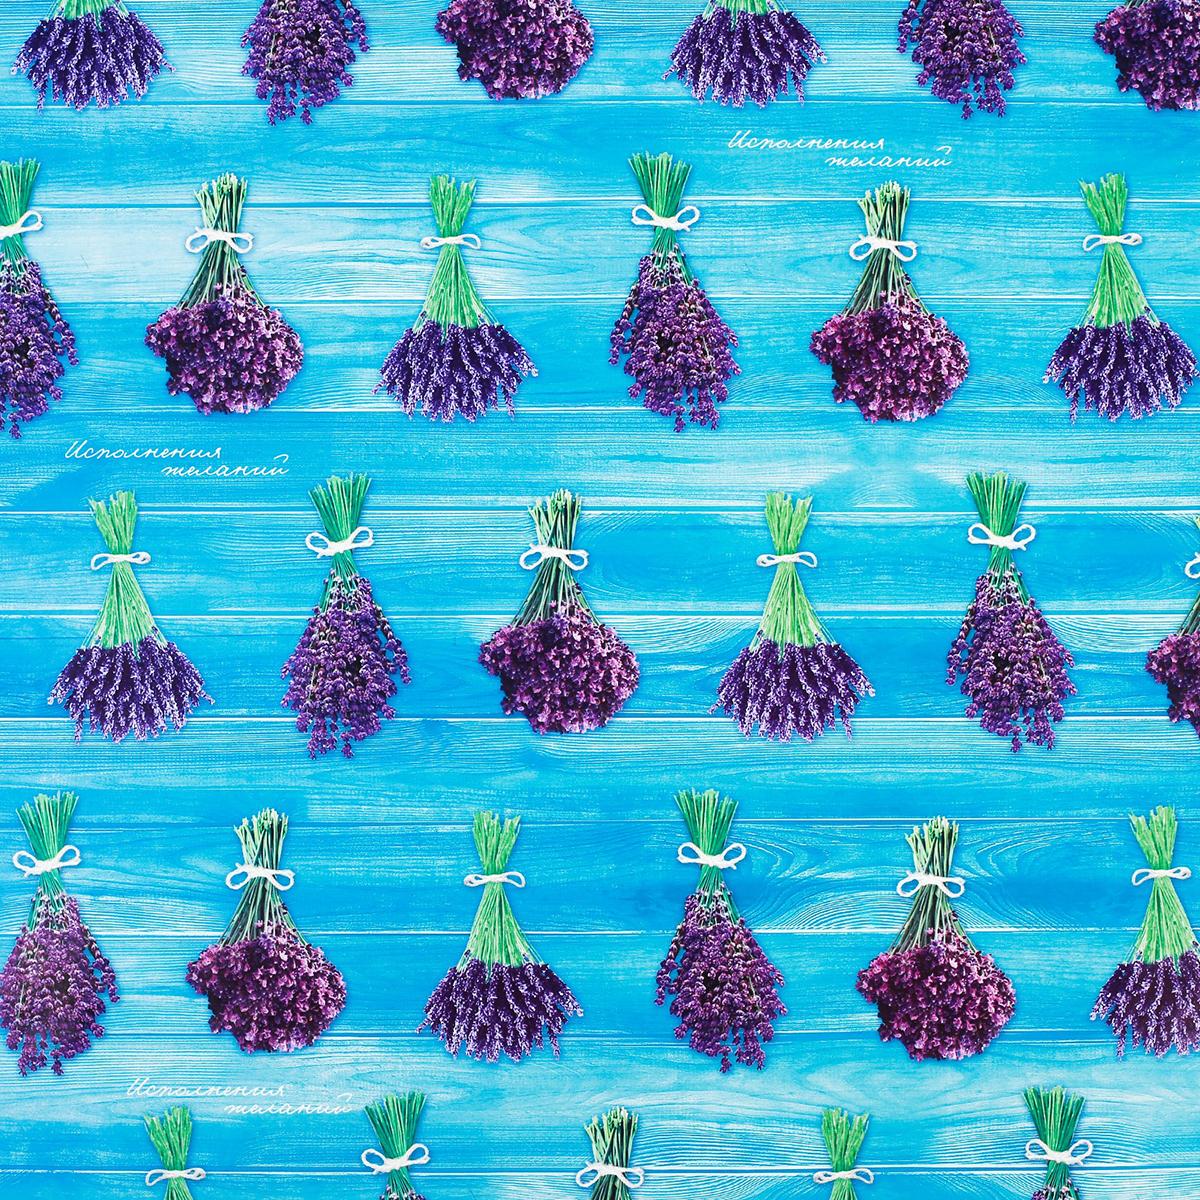 Бумага упаковочная Дарите счастье Лаванда, глянцевая, 70 х 100 см. 2924096 бумага упаковочная дарите счастье цветы глянцевая 70 х 100 см 2887323